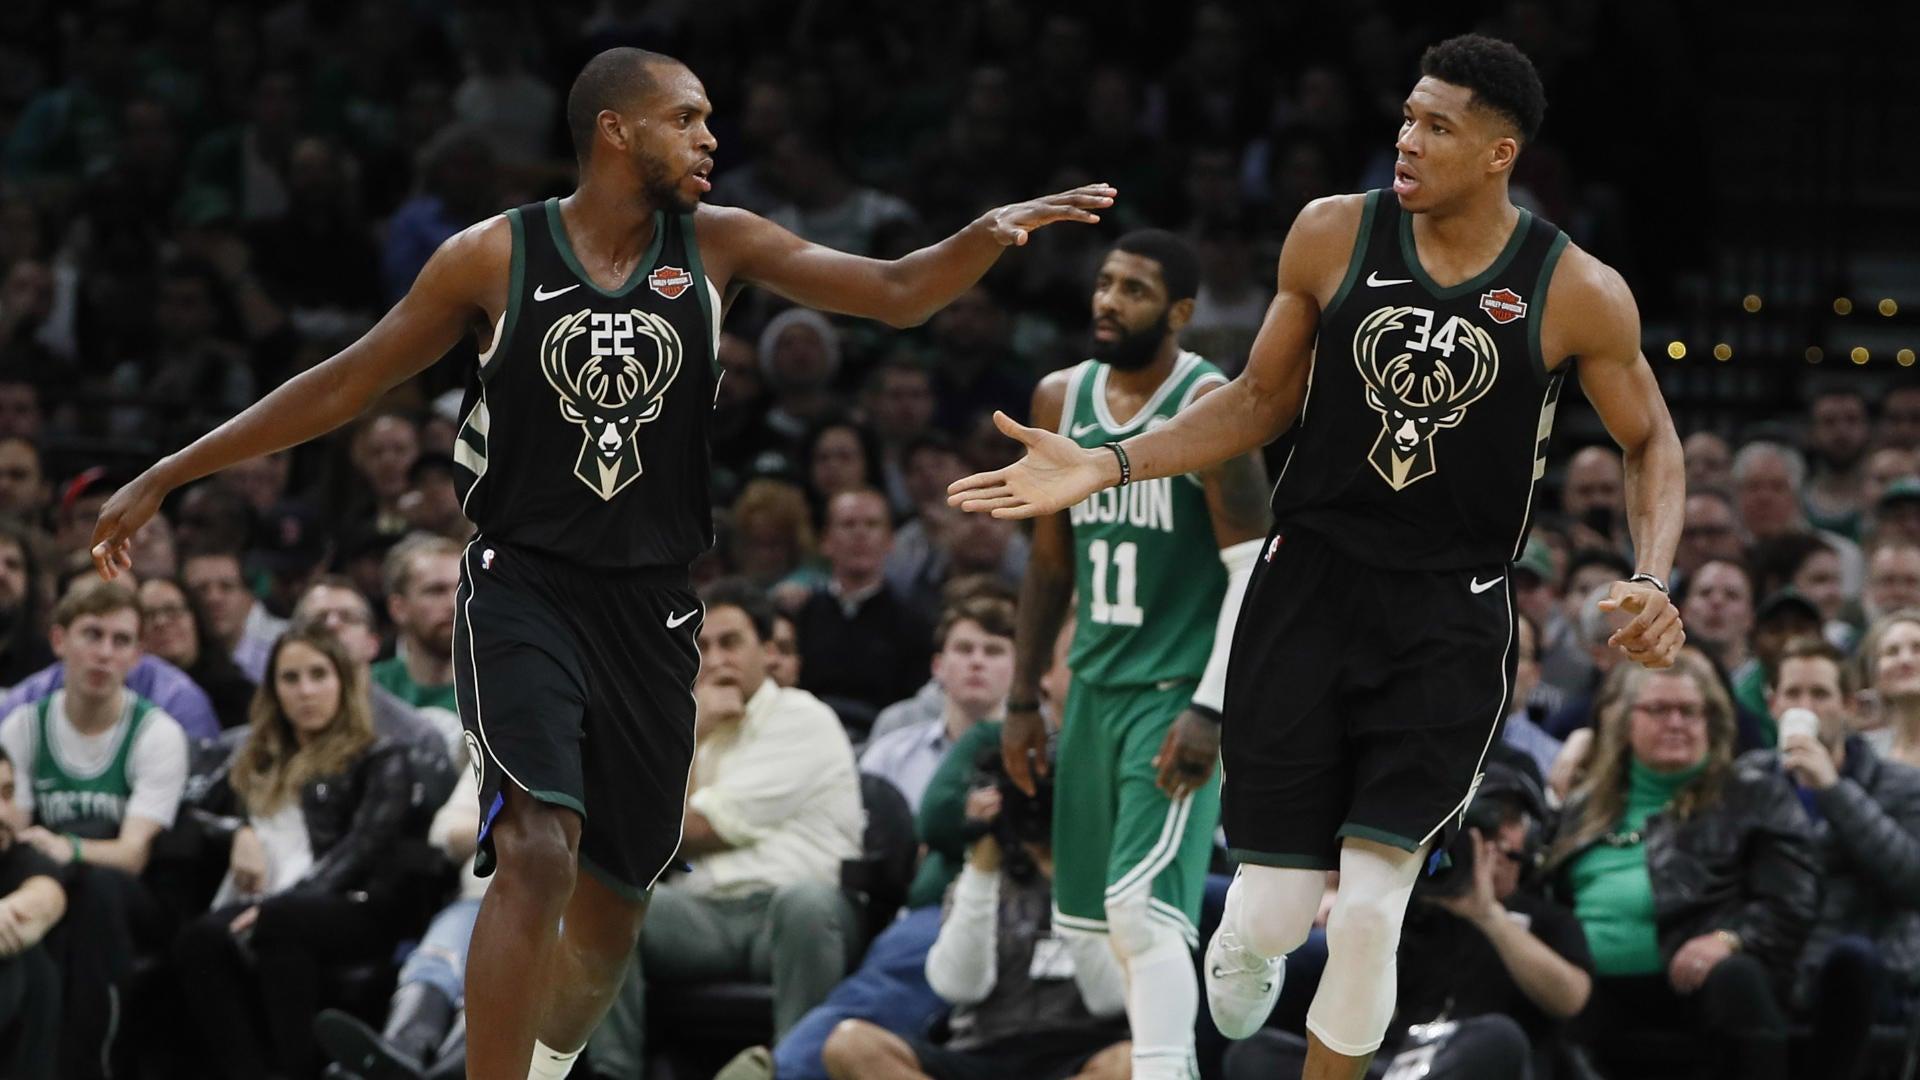 Trail Blazers vs. 76ers: Watch NBA online, live stream, TV channel, time, odds, picks, analysis